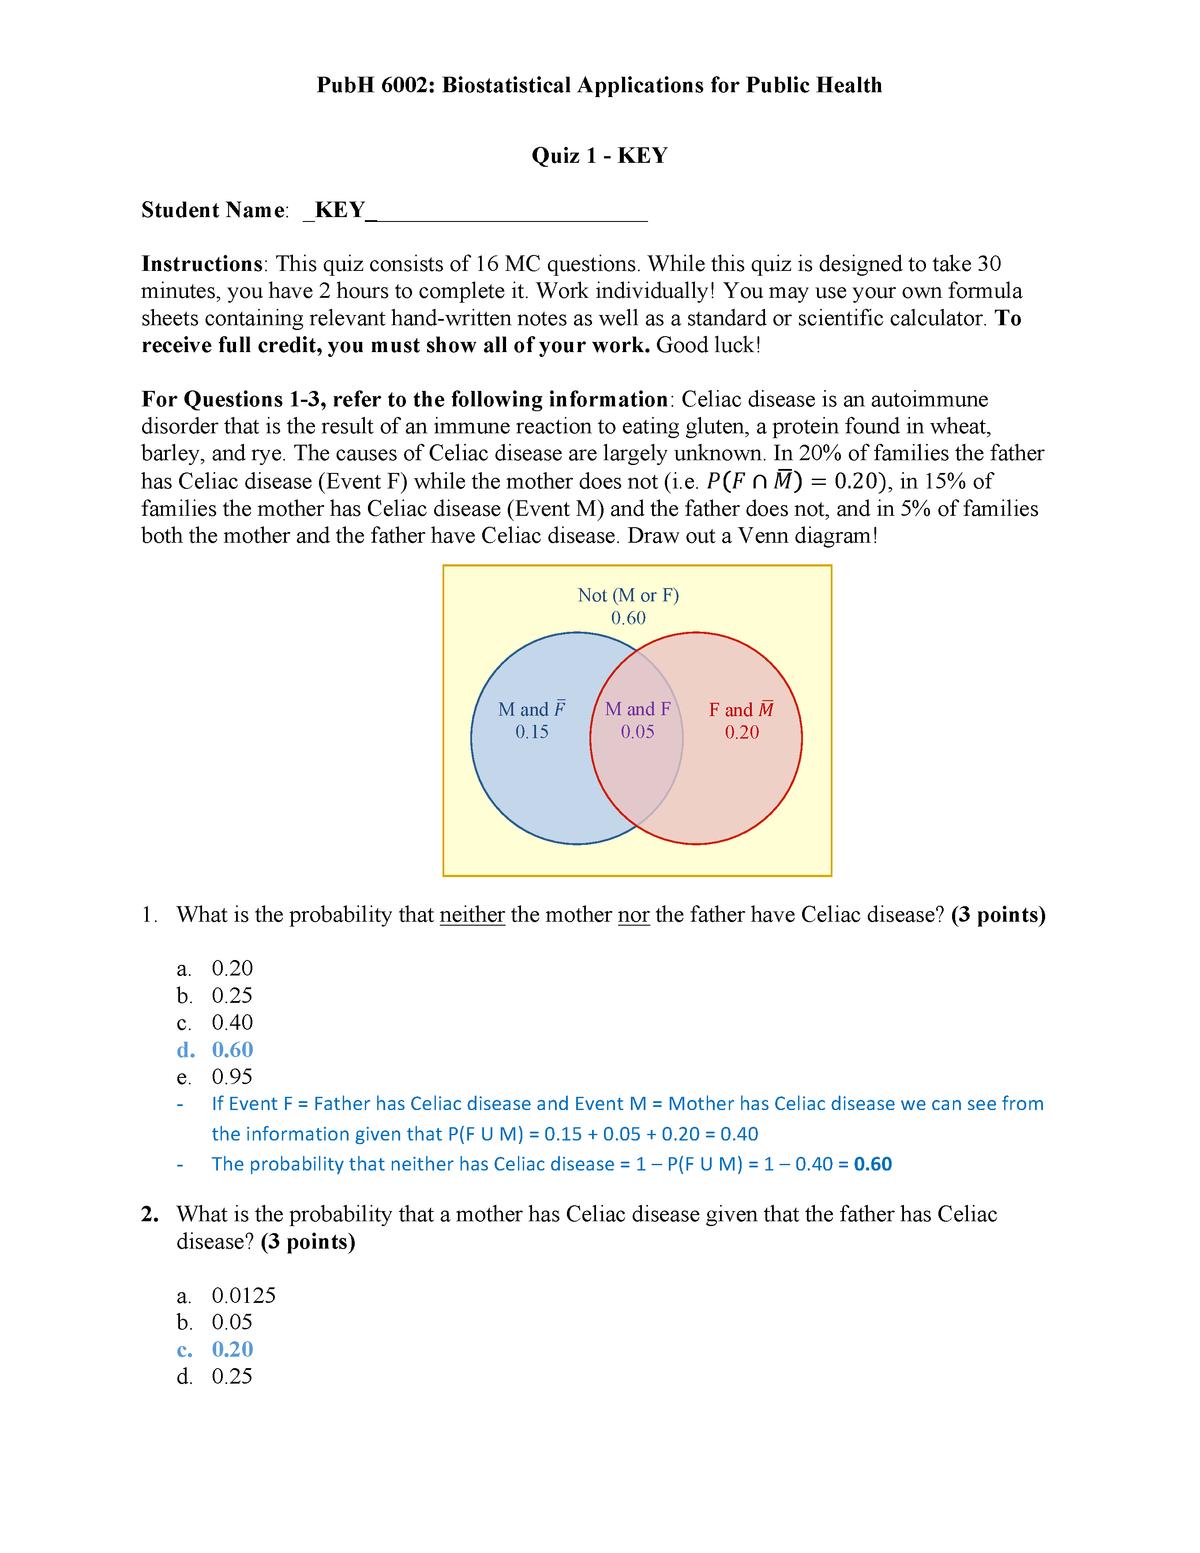 Quiz 1 September 2018, answers - PUBH 6002 - GWU - StuDocu